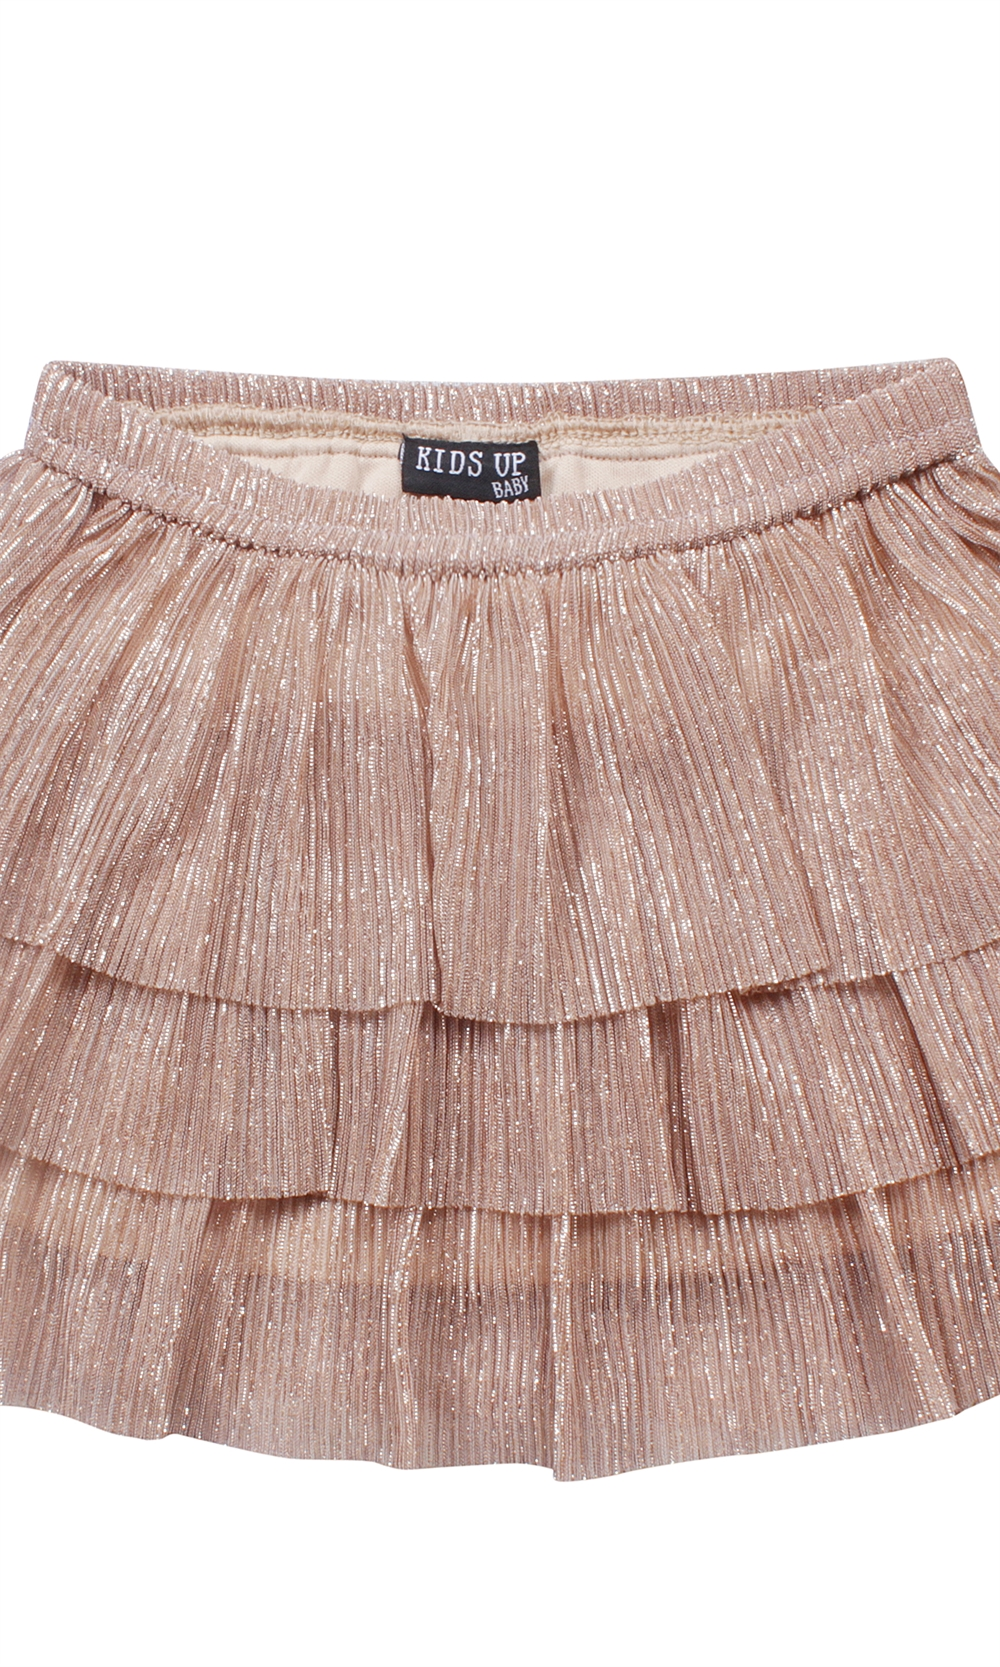 Ducky kjol